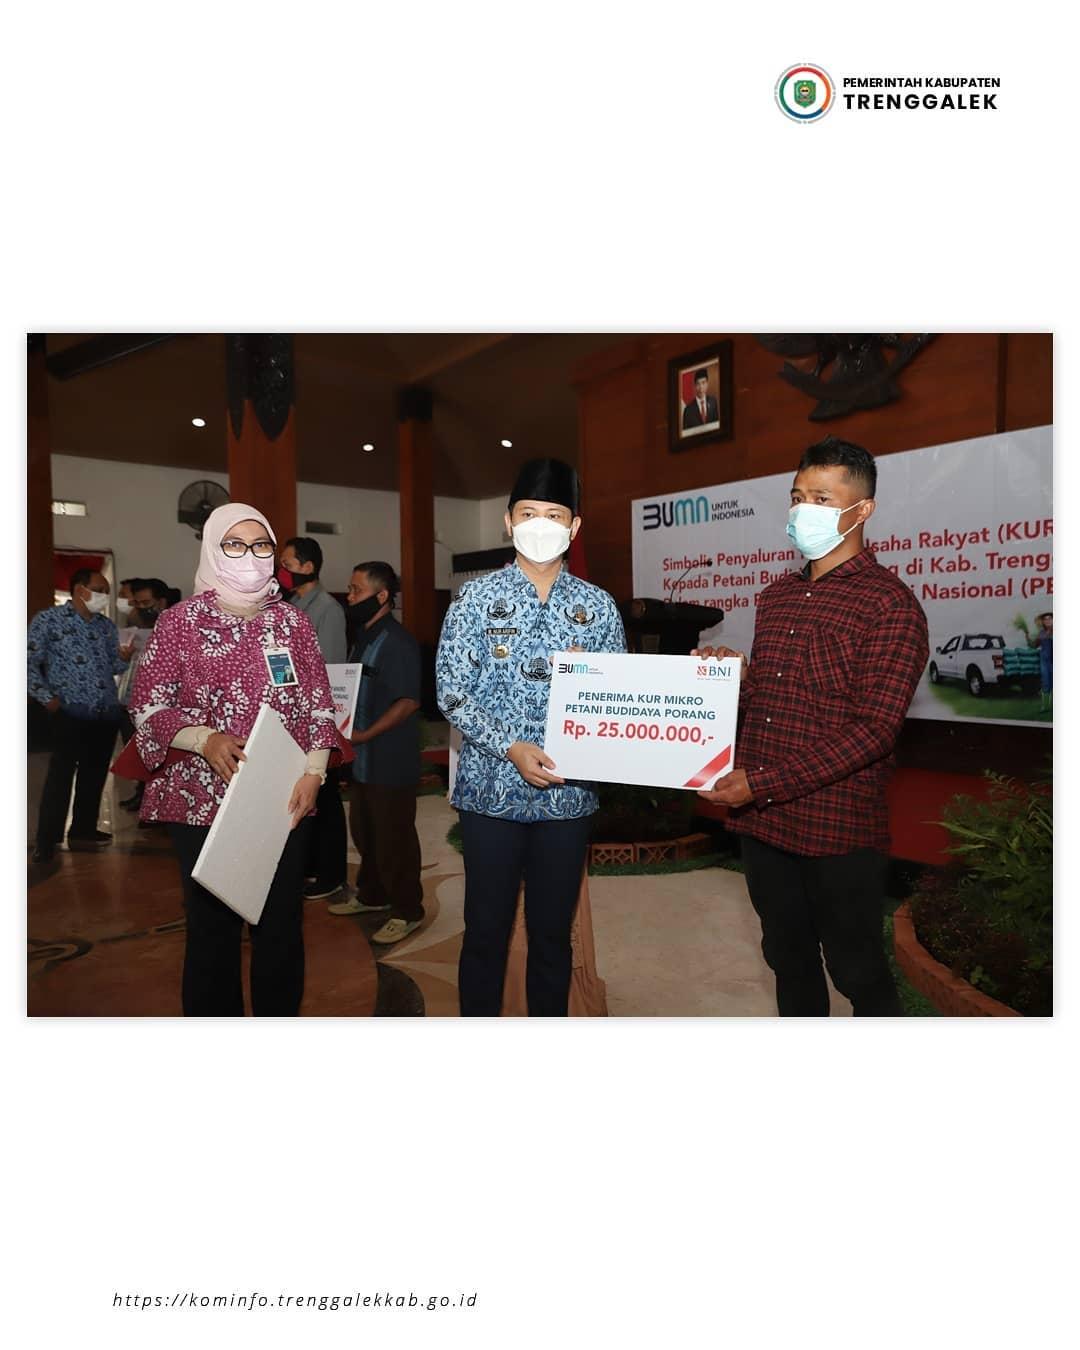 228 Petani Porang Dapatkan Pinjaman KUR Mikro, Bupati Nur Arifin Harapkan Mampu Ungkit Perekonomian di Trenggalek